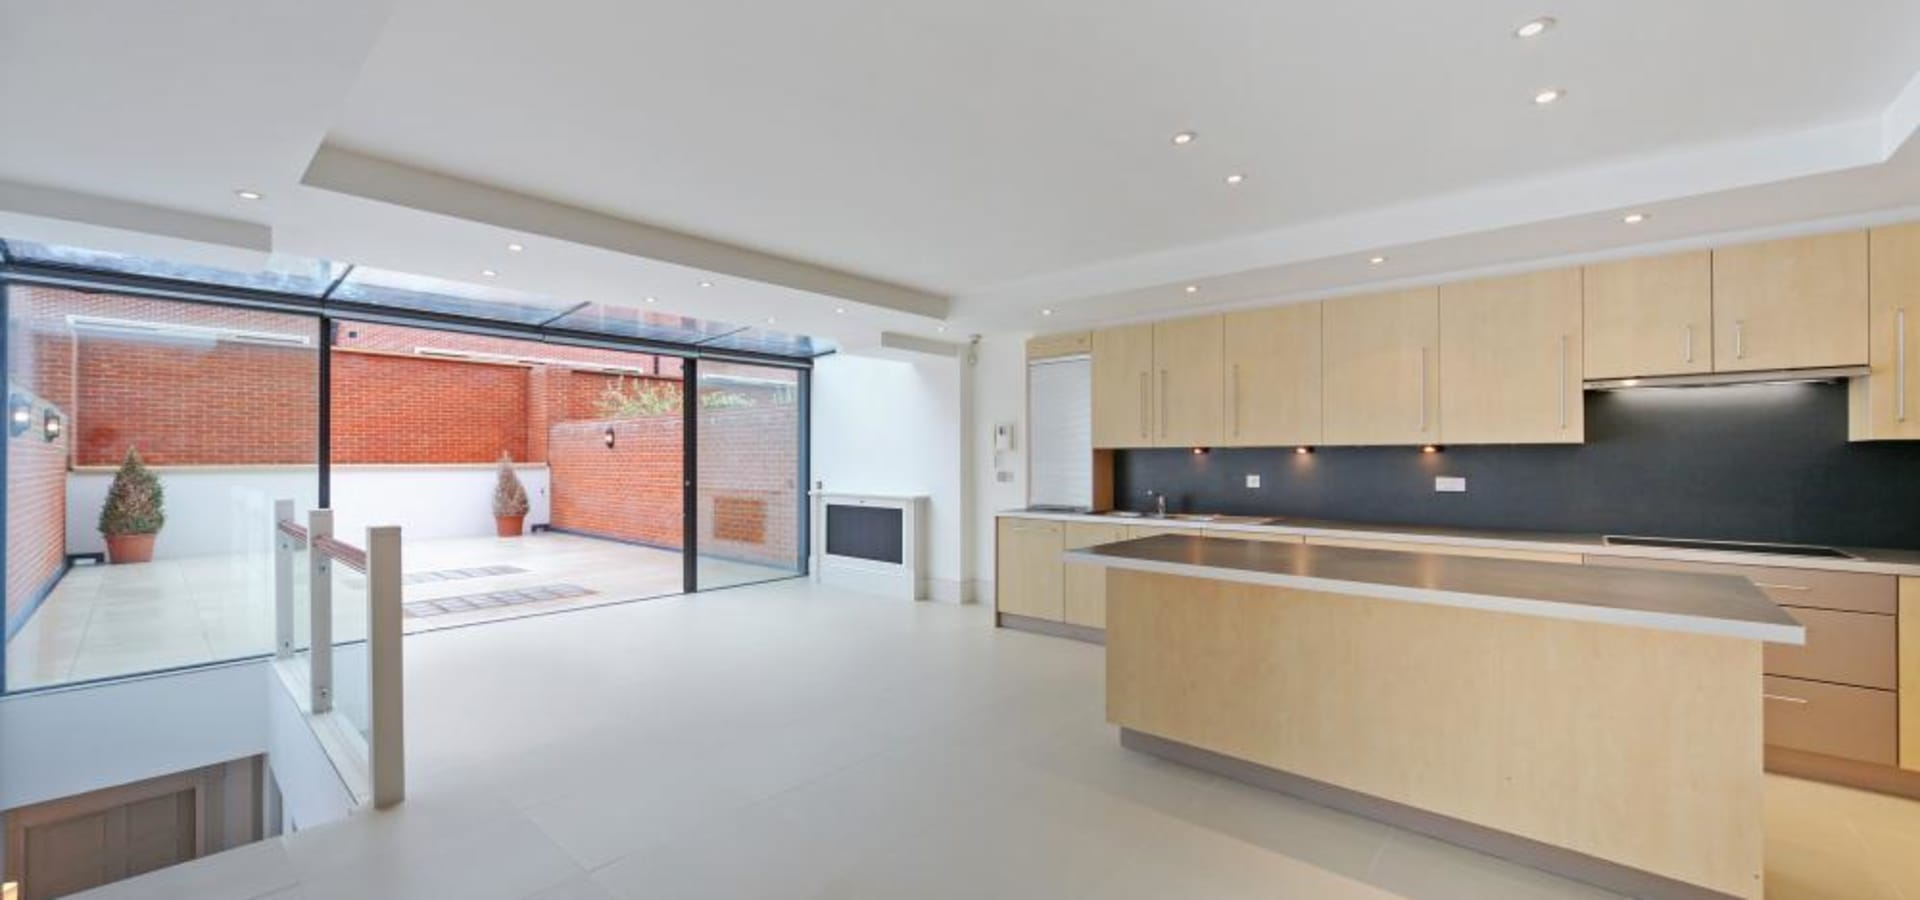 House Renovation London Ltd